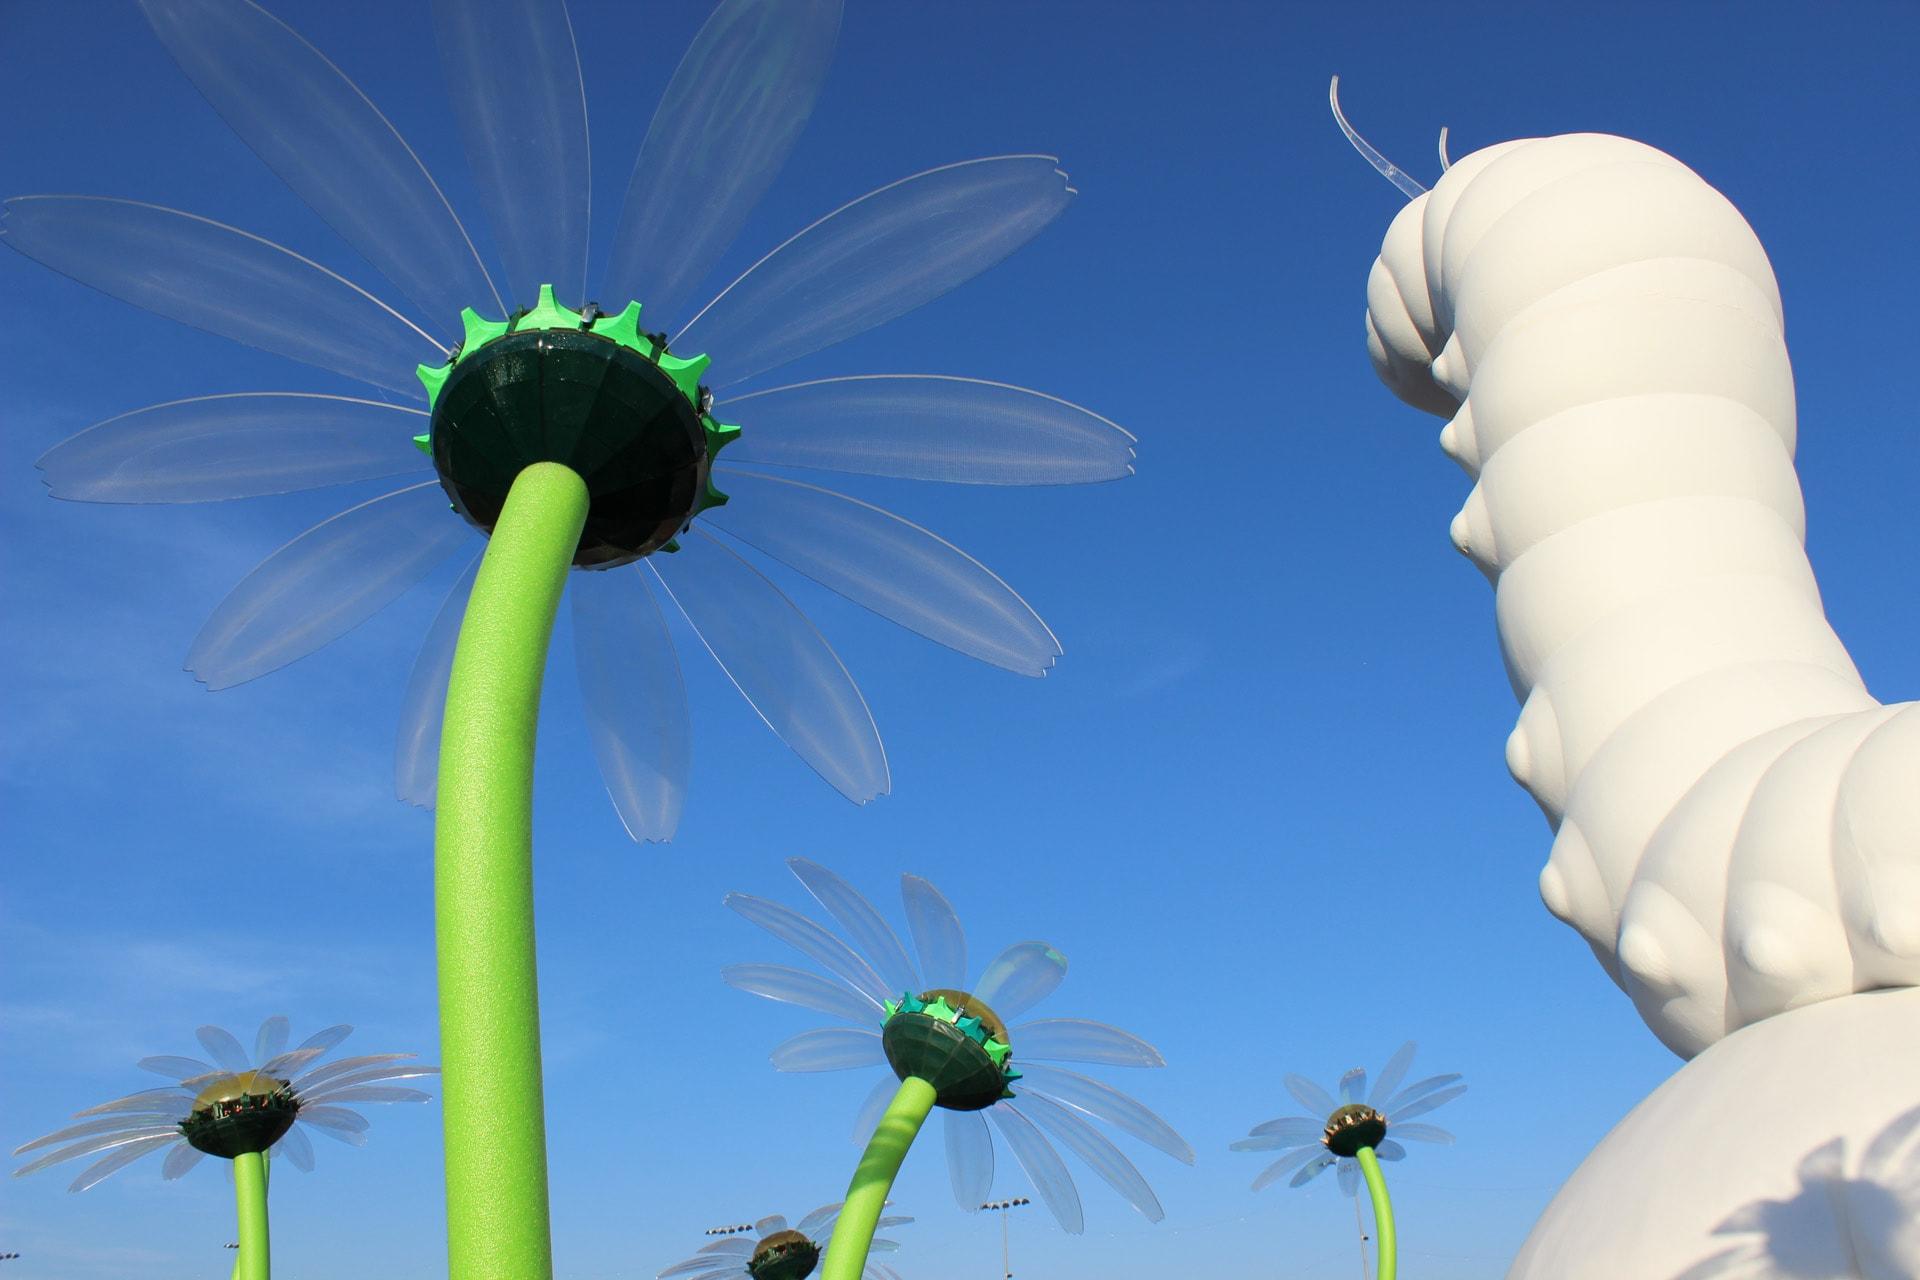 EDC Caterpillar / Caterpillar's Garden